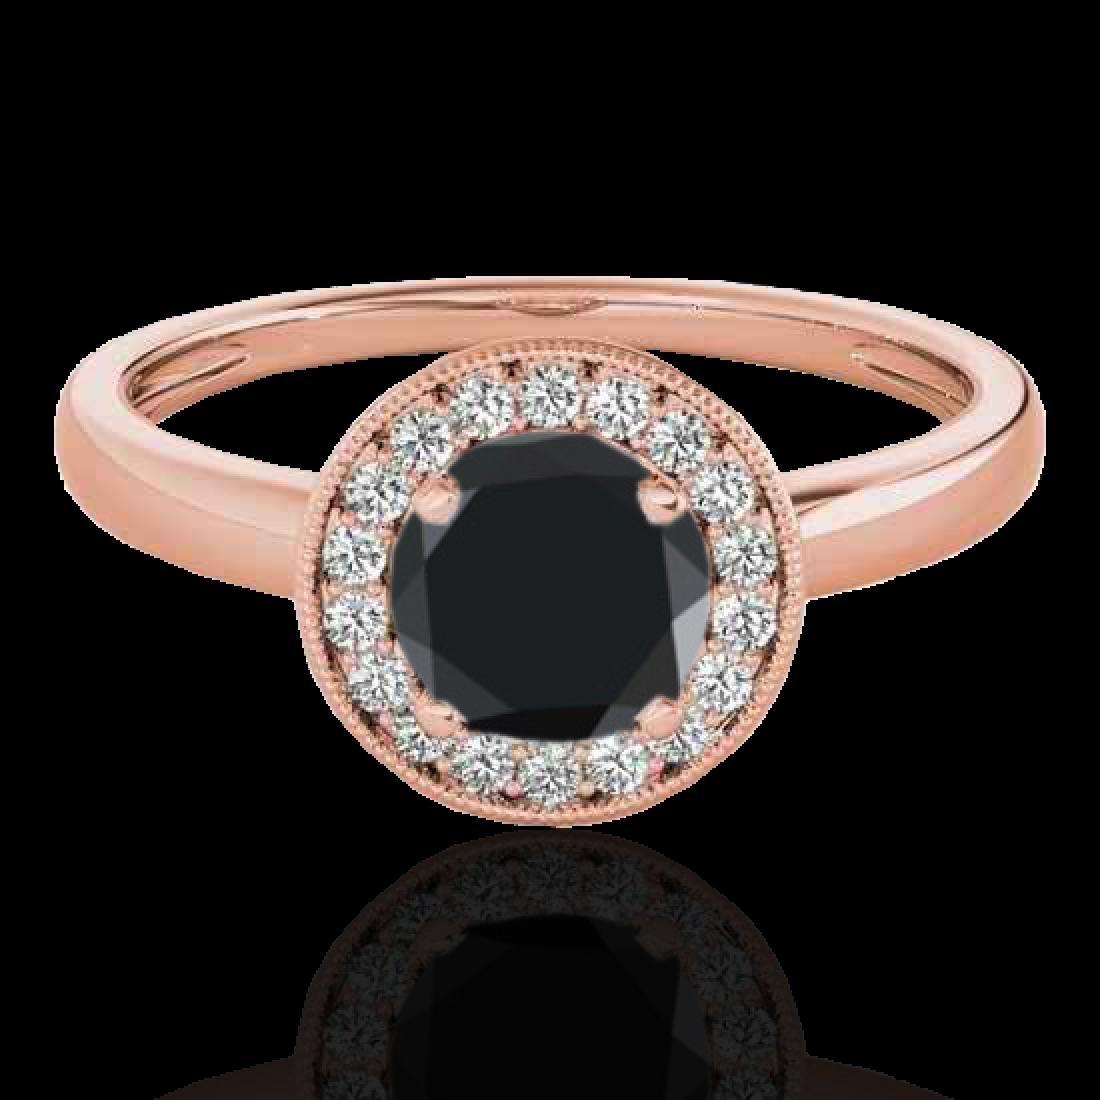 1.15 CTW Certified VS Black Diamond Solitaire Halo Ring